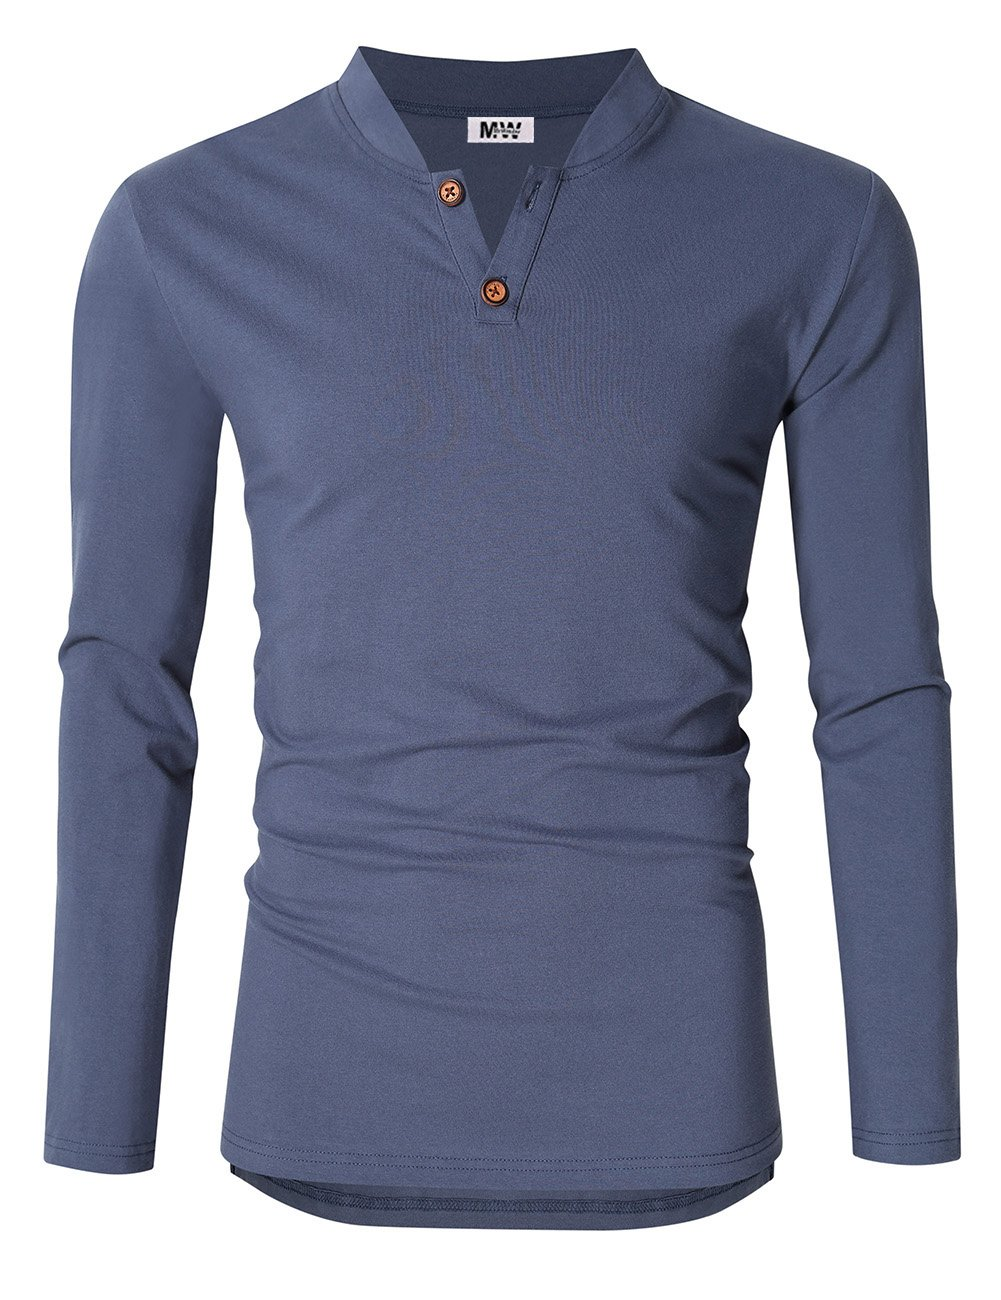 MrWonder Men's Casual Linen and Cotton V Neck Short Sleeve Henley T-Shirts JJ#02A*MWA1702AA-A304